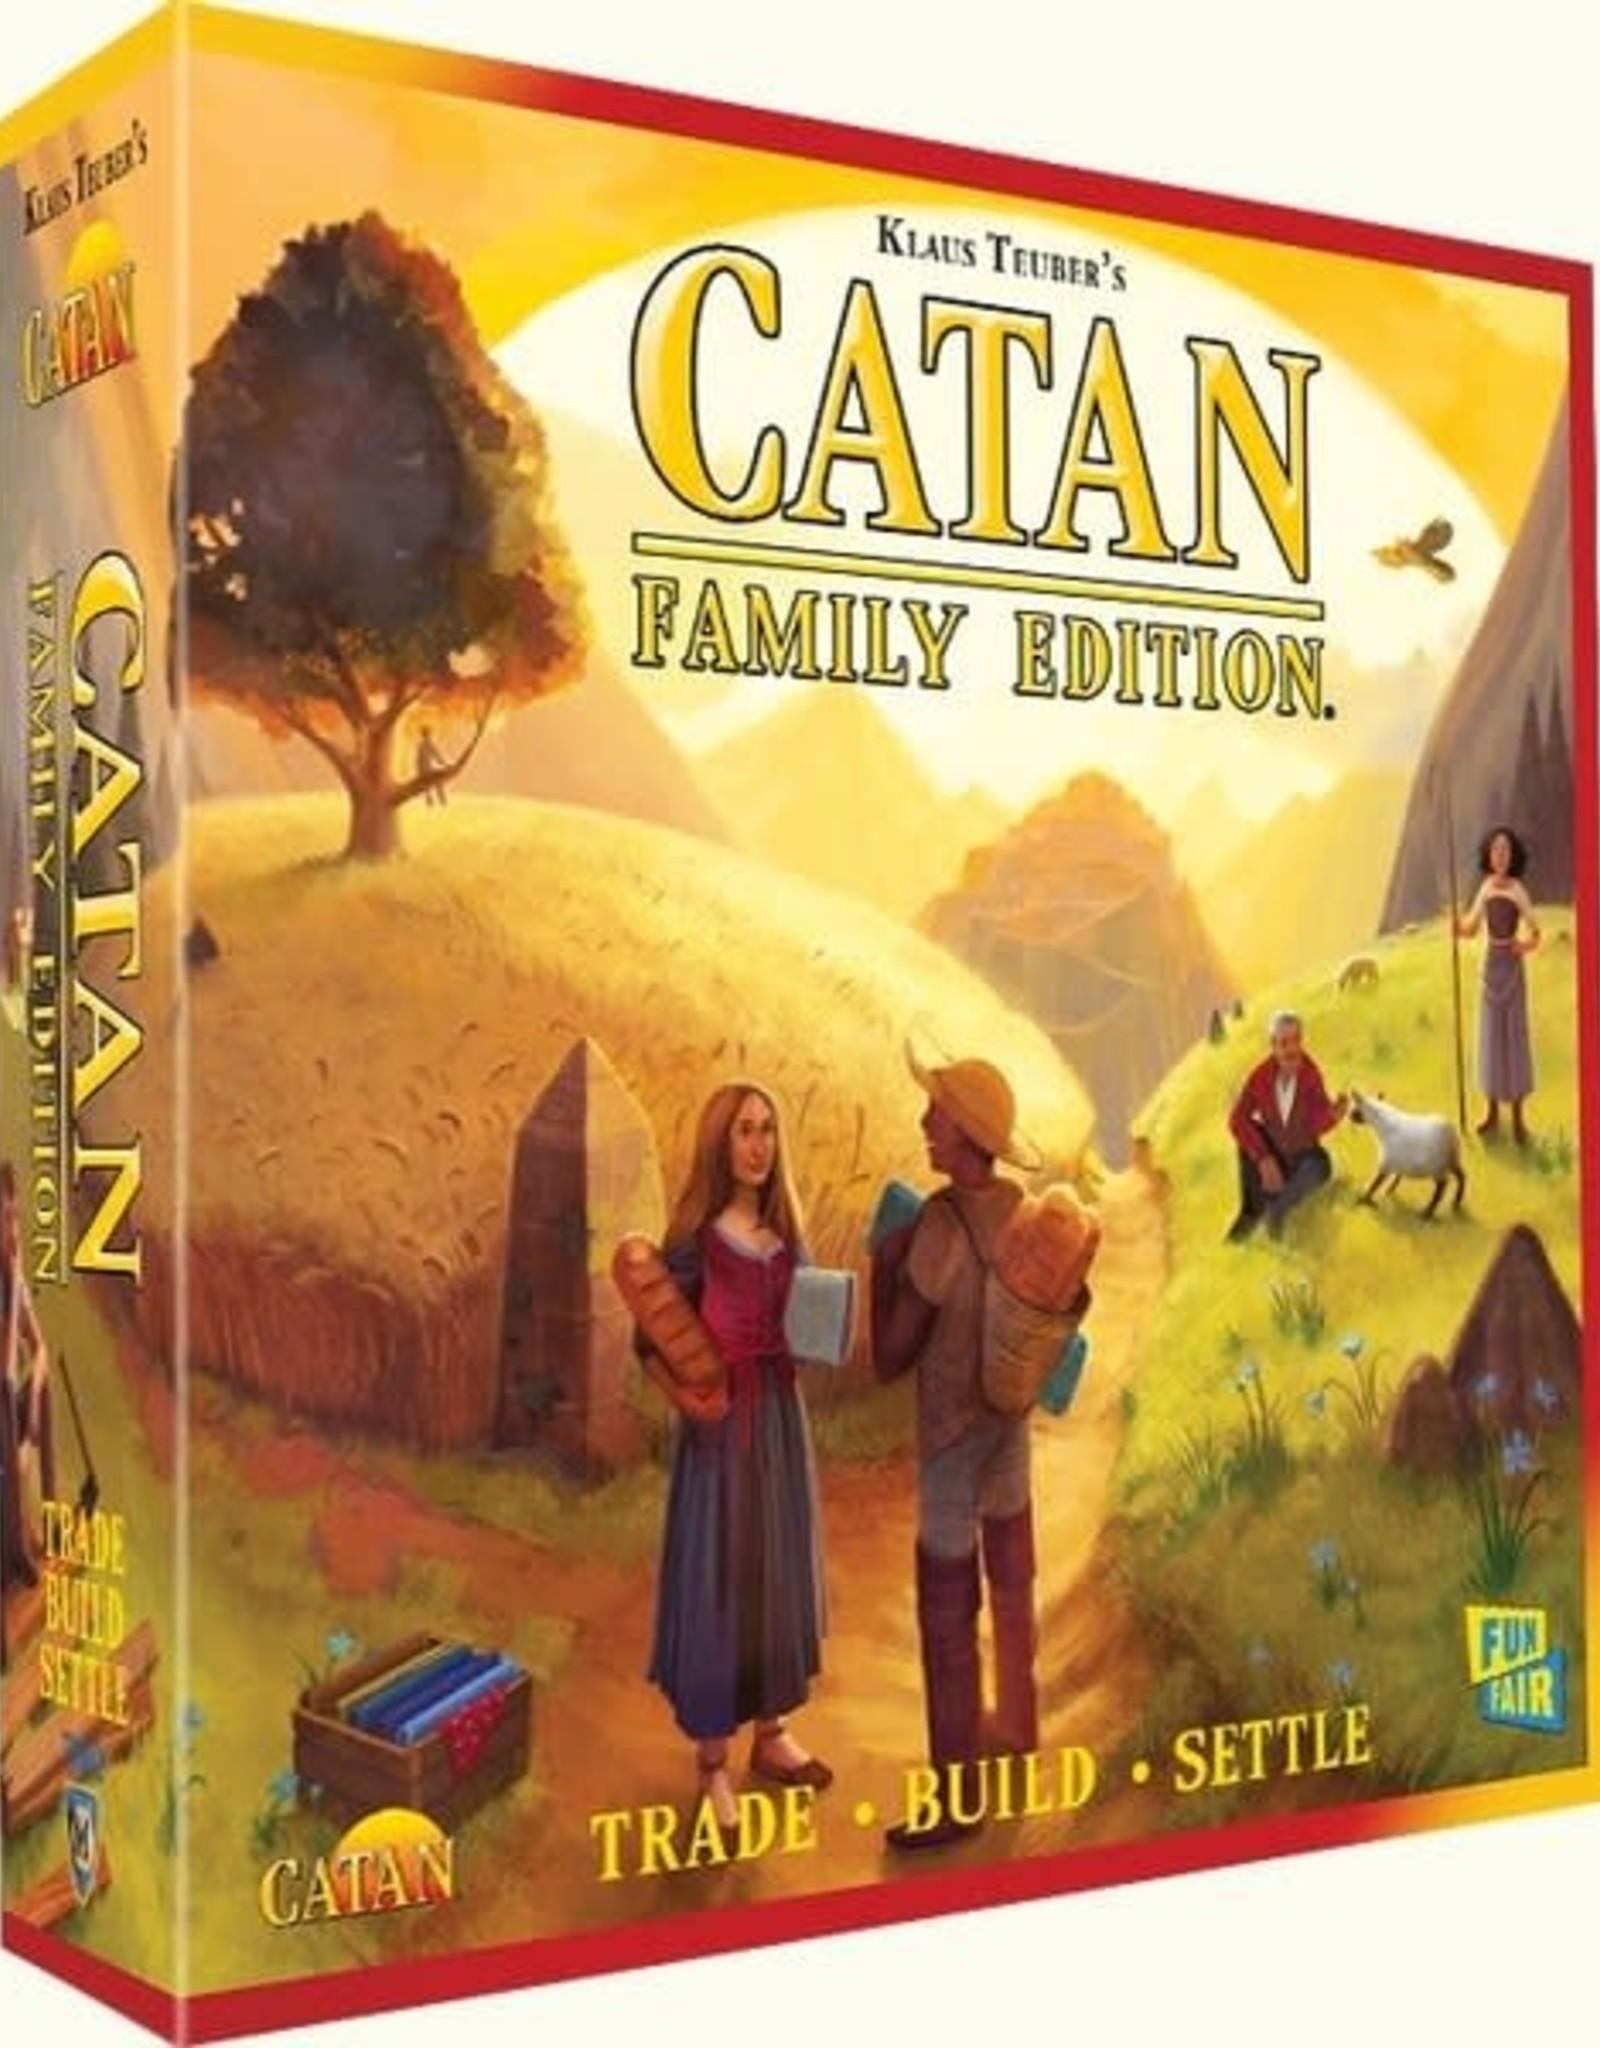 Catan Studio Catan Family Edition